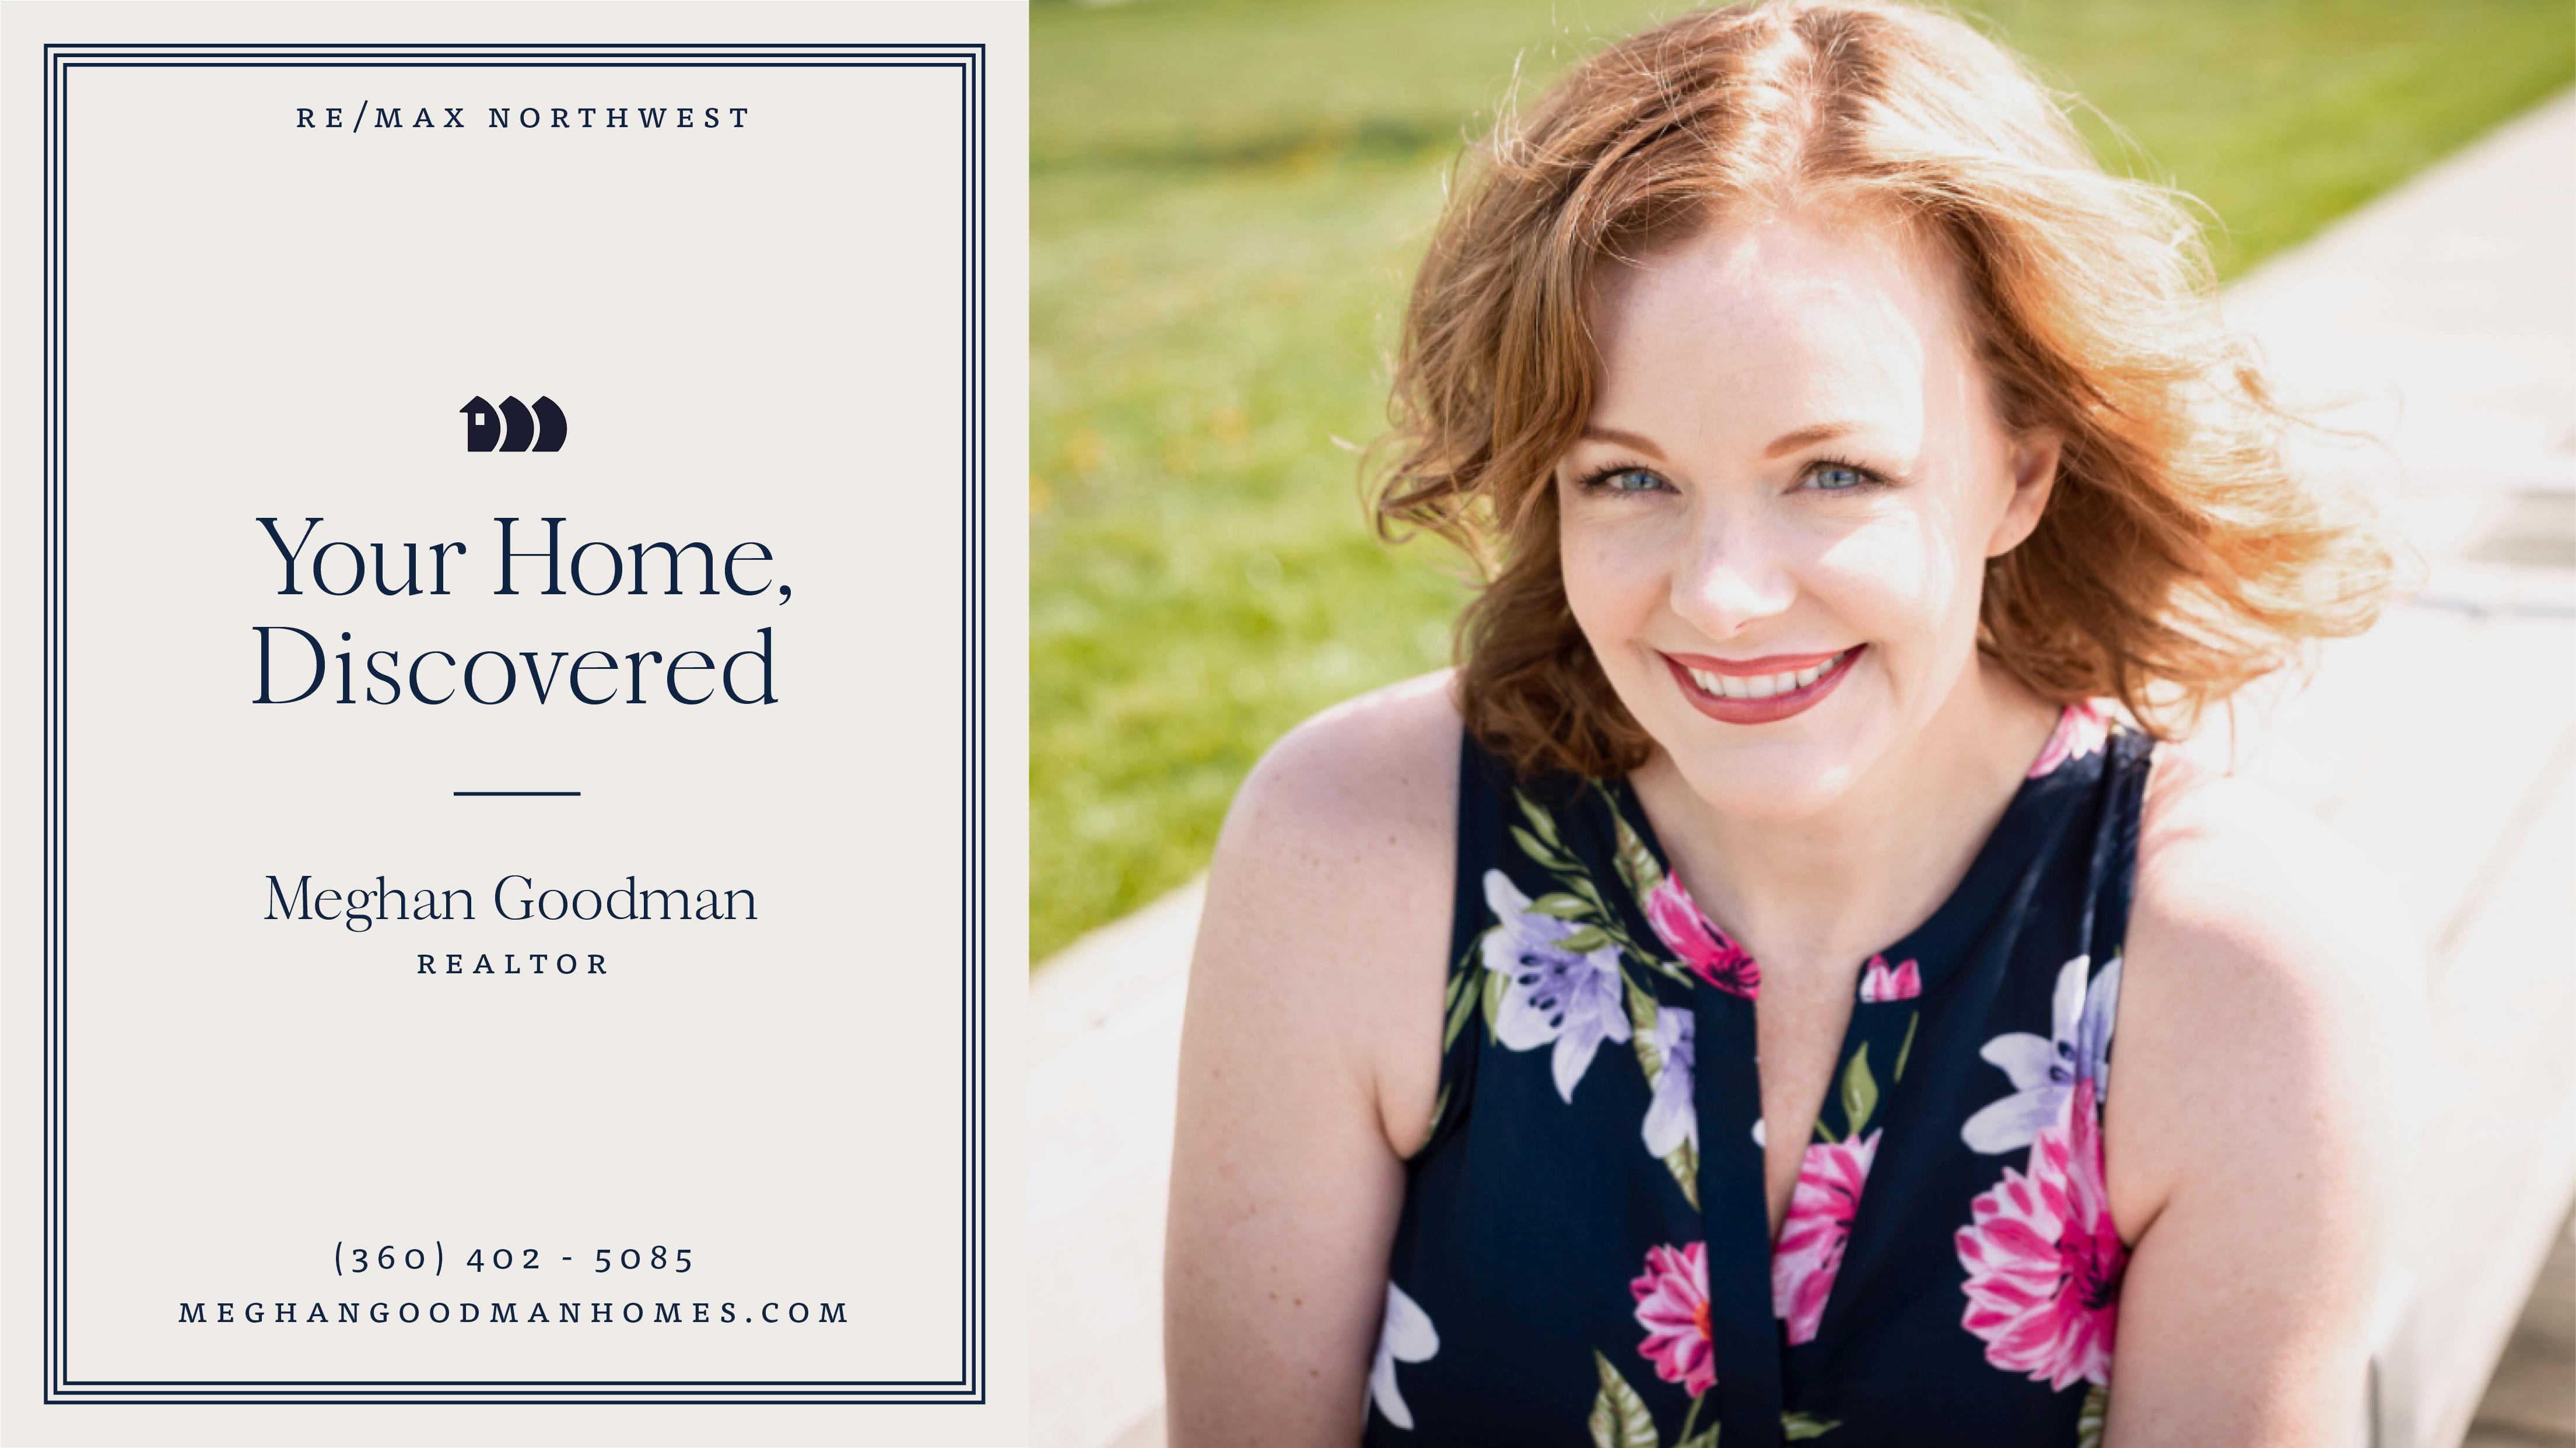 Meghan undefined Goodman